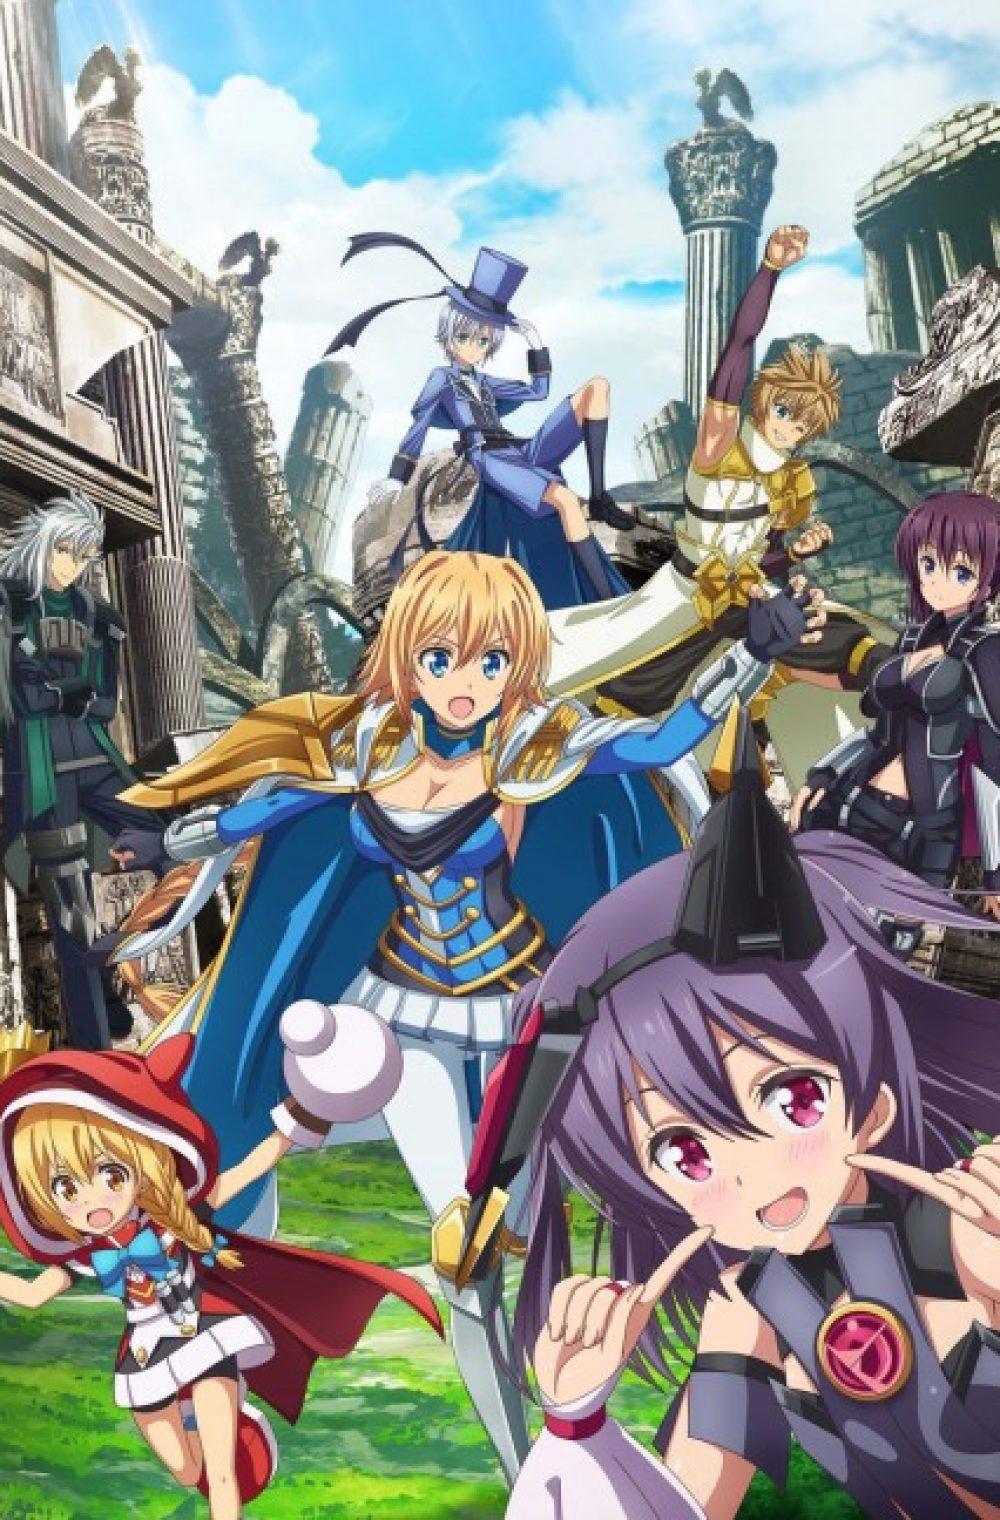 Hangyaku-sei Million Arthur 2